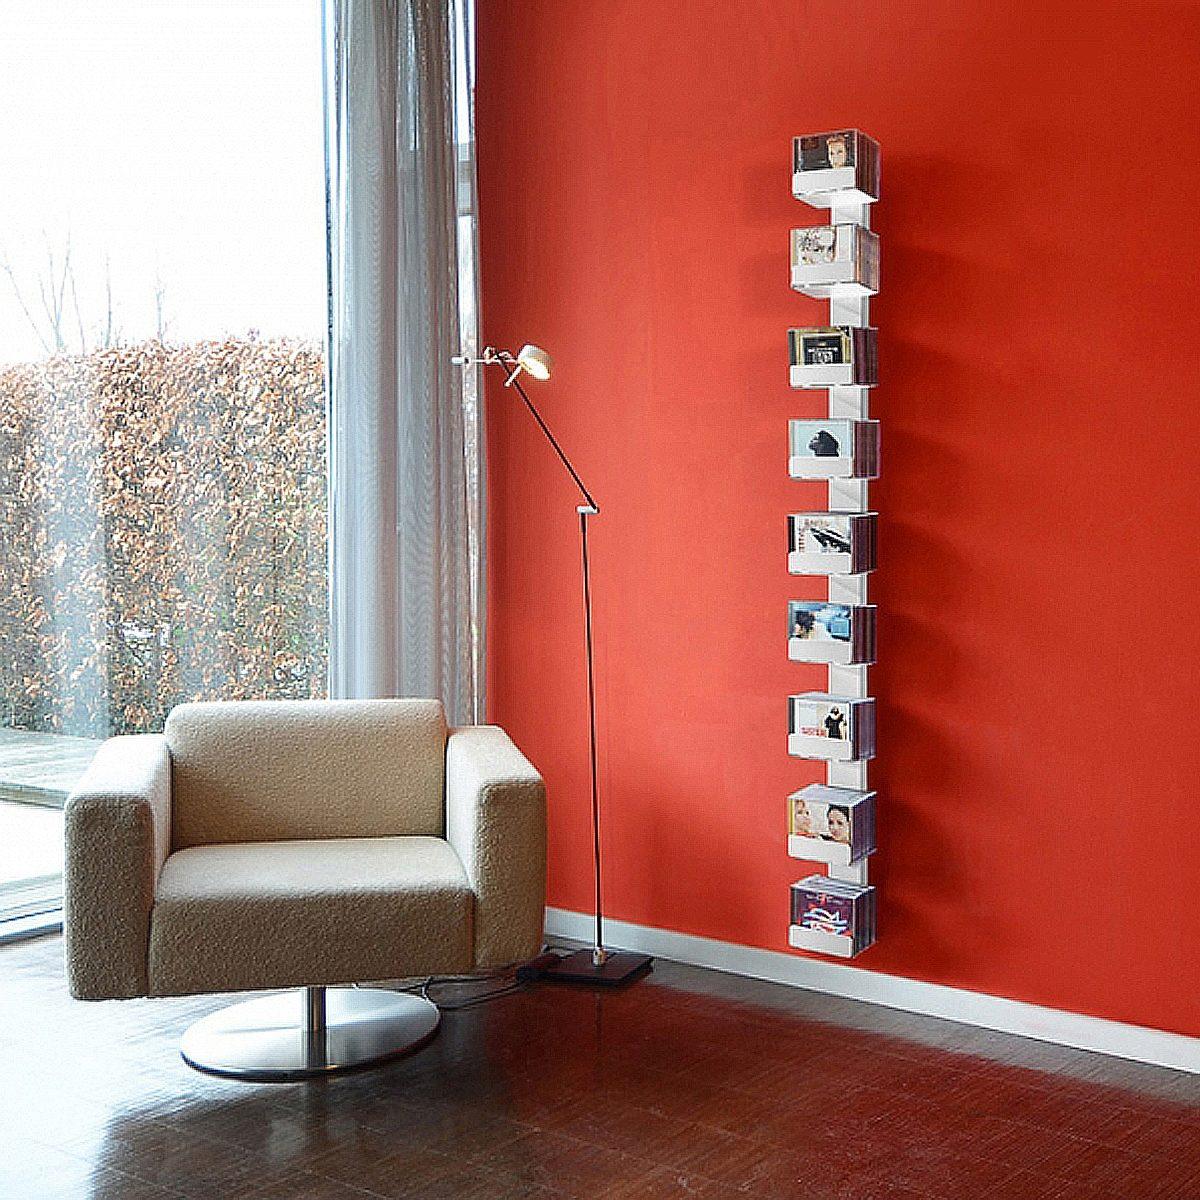 Radius RADIUS CD-Baum 2 Wand groß, weiß